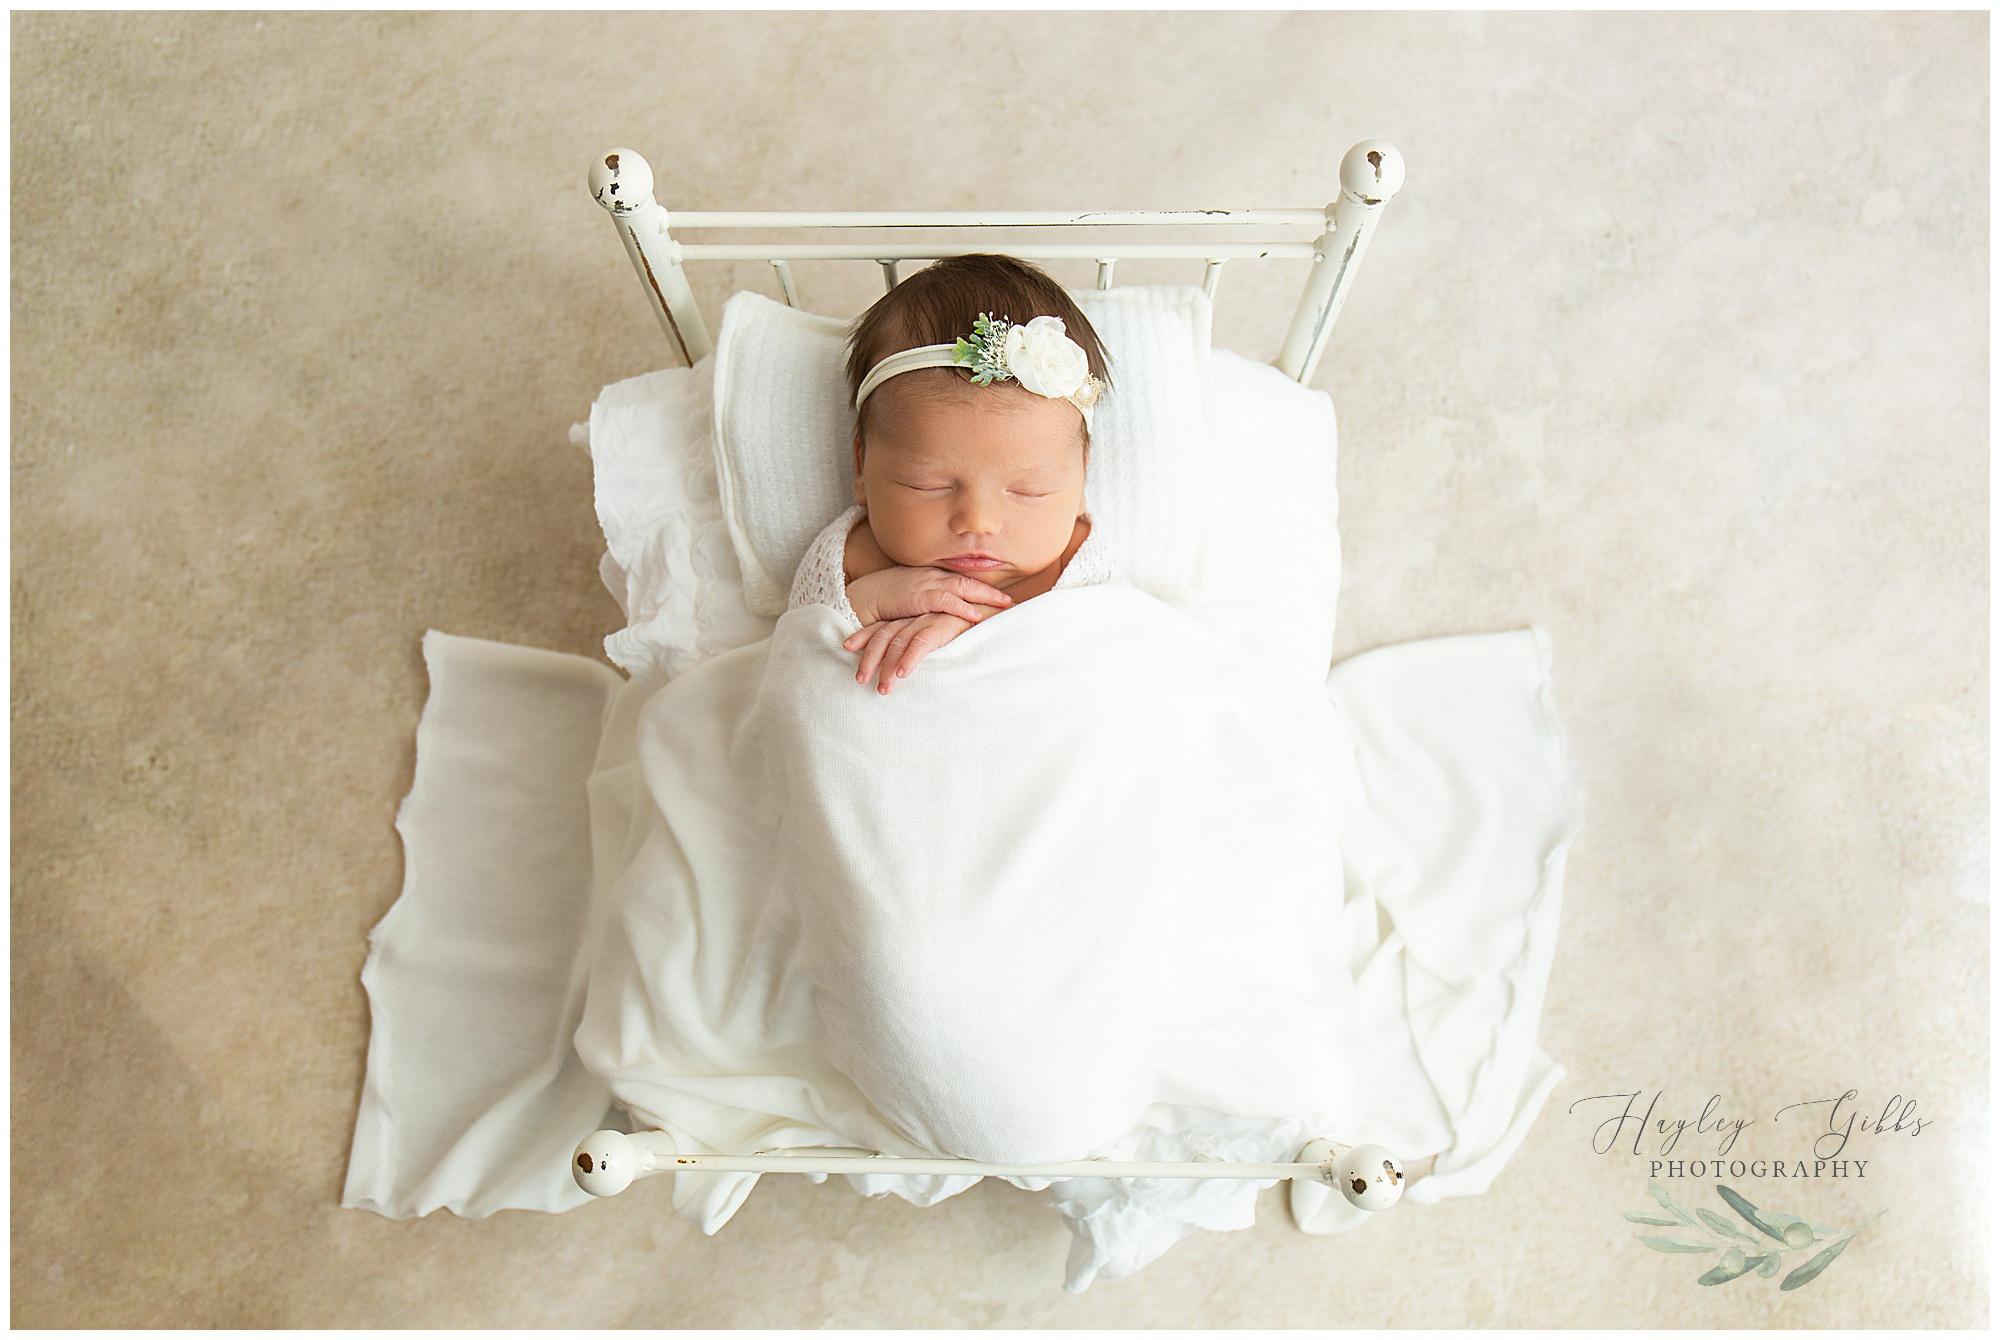 Hayley Gibbs Photography, Snead Alabama Photographer, Newborn Photographer, Oneonta Alabama Newborn Photographer, Oneonta Alabama Photographer, Newborn Photography, Snead Alabama, Professional Newborn Photography, Best Newborn Photographer